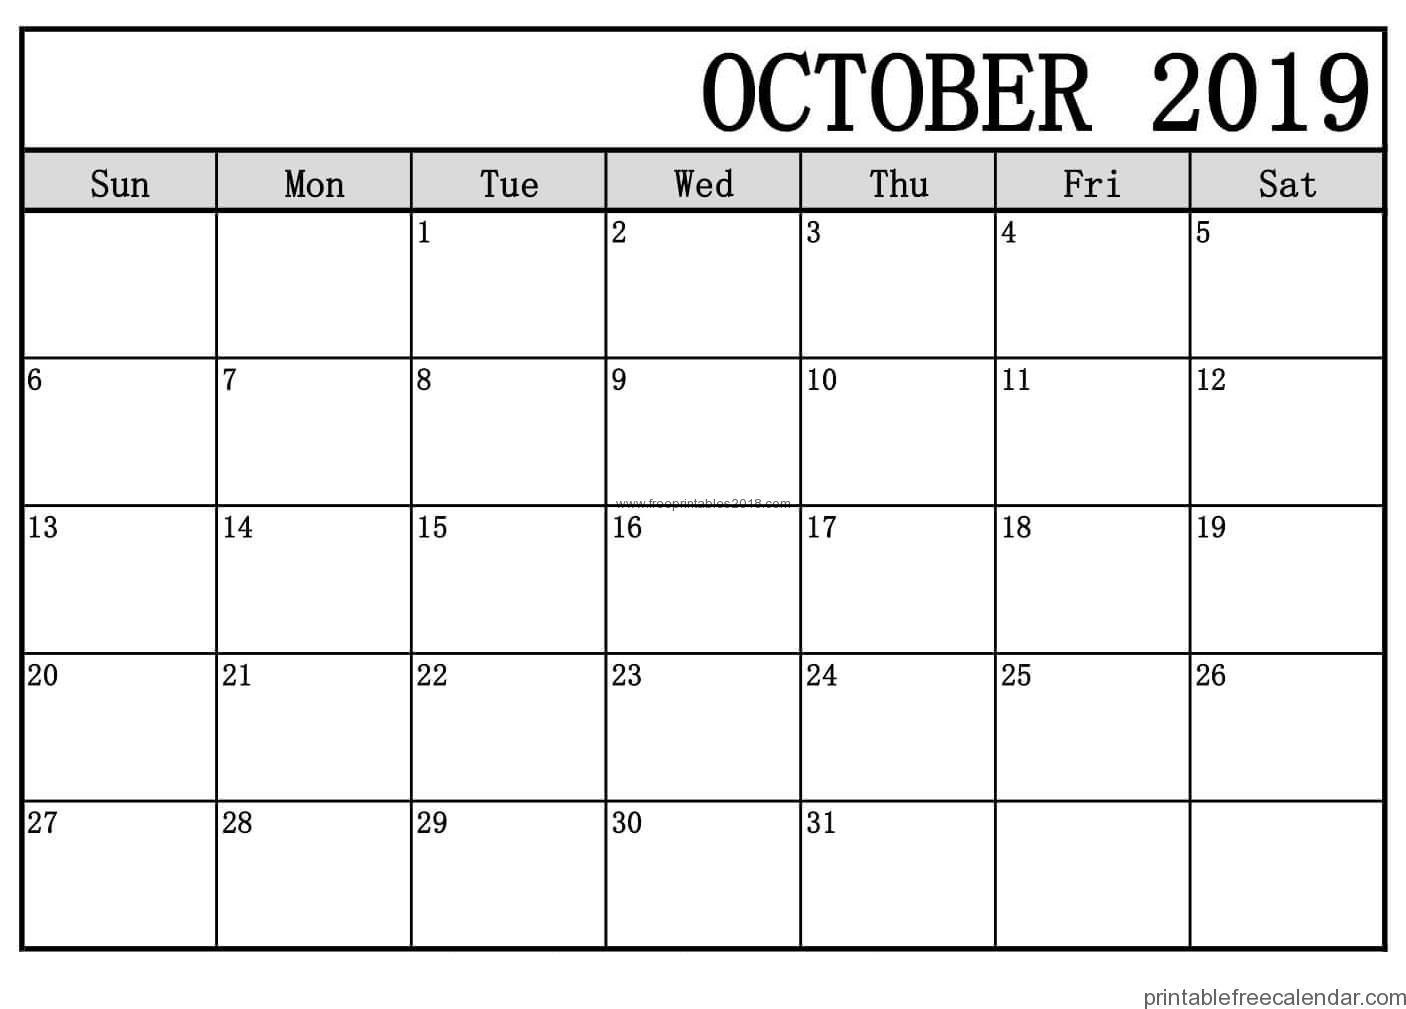 Free Printable October 2019 Calendar Templates | Free Printables 2019 - Free October Printables